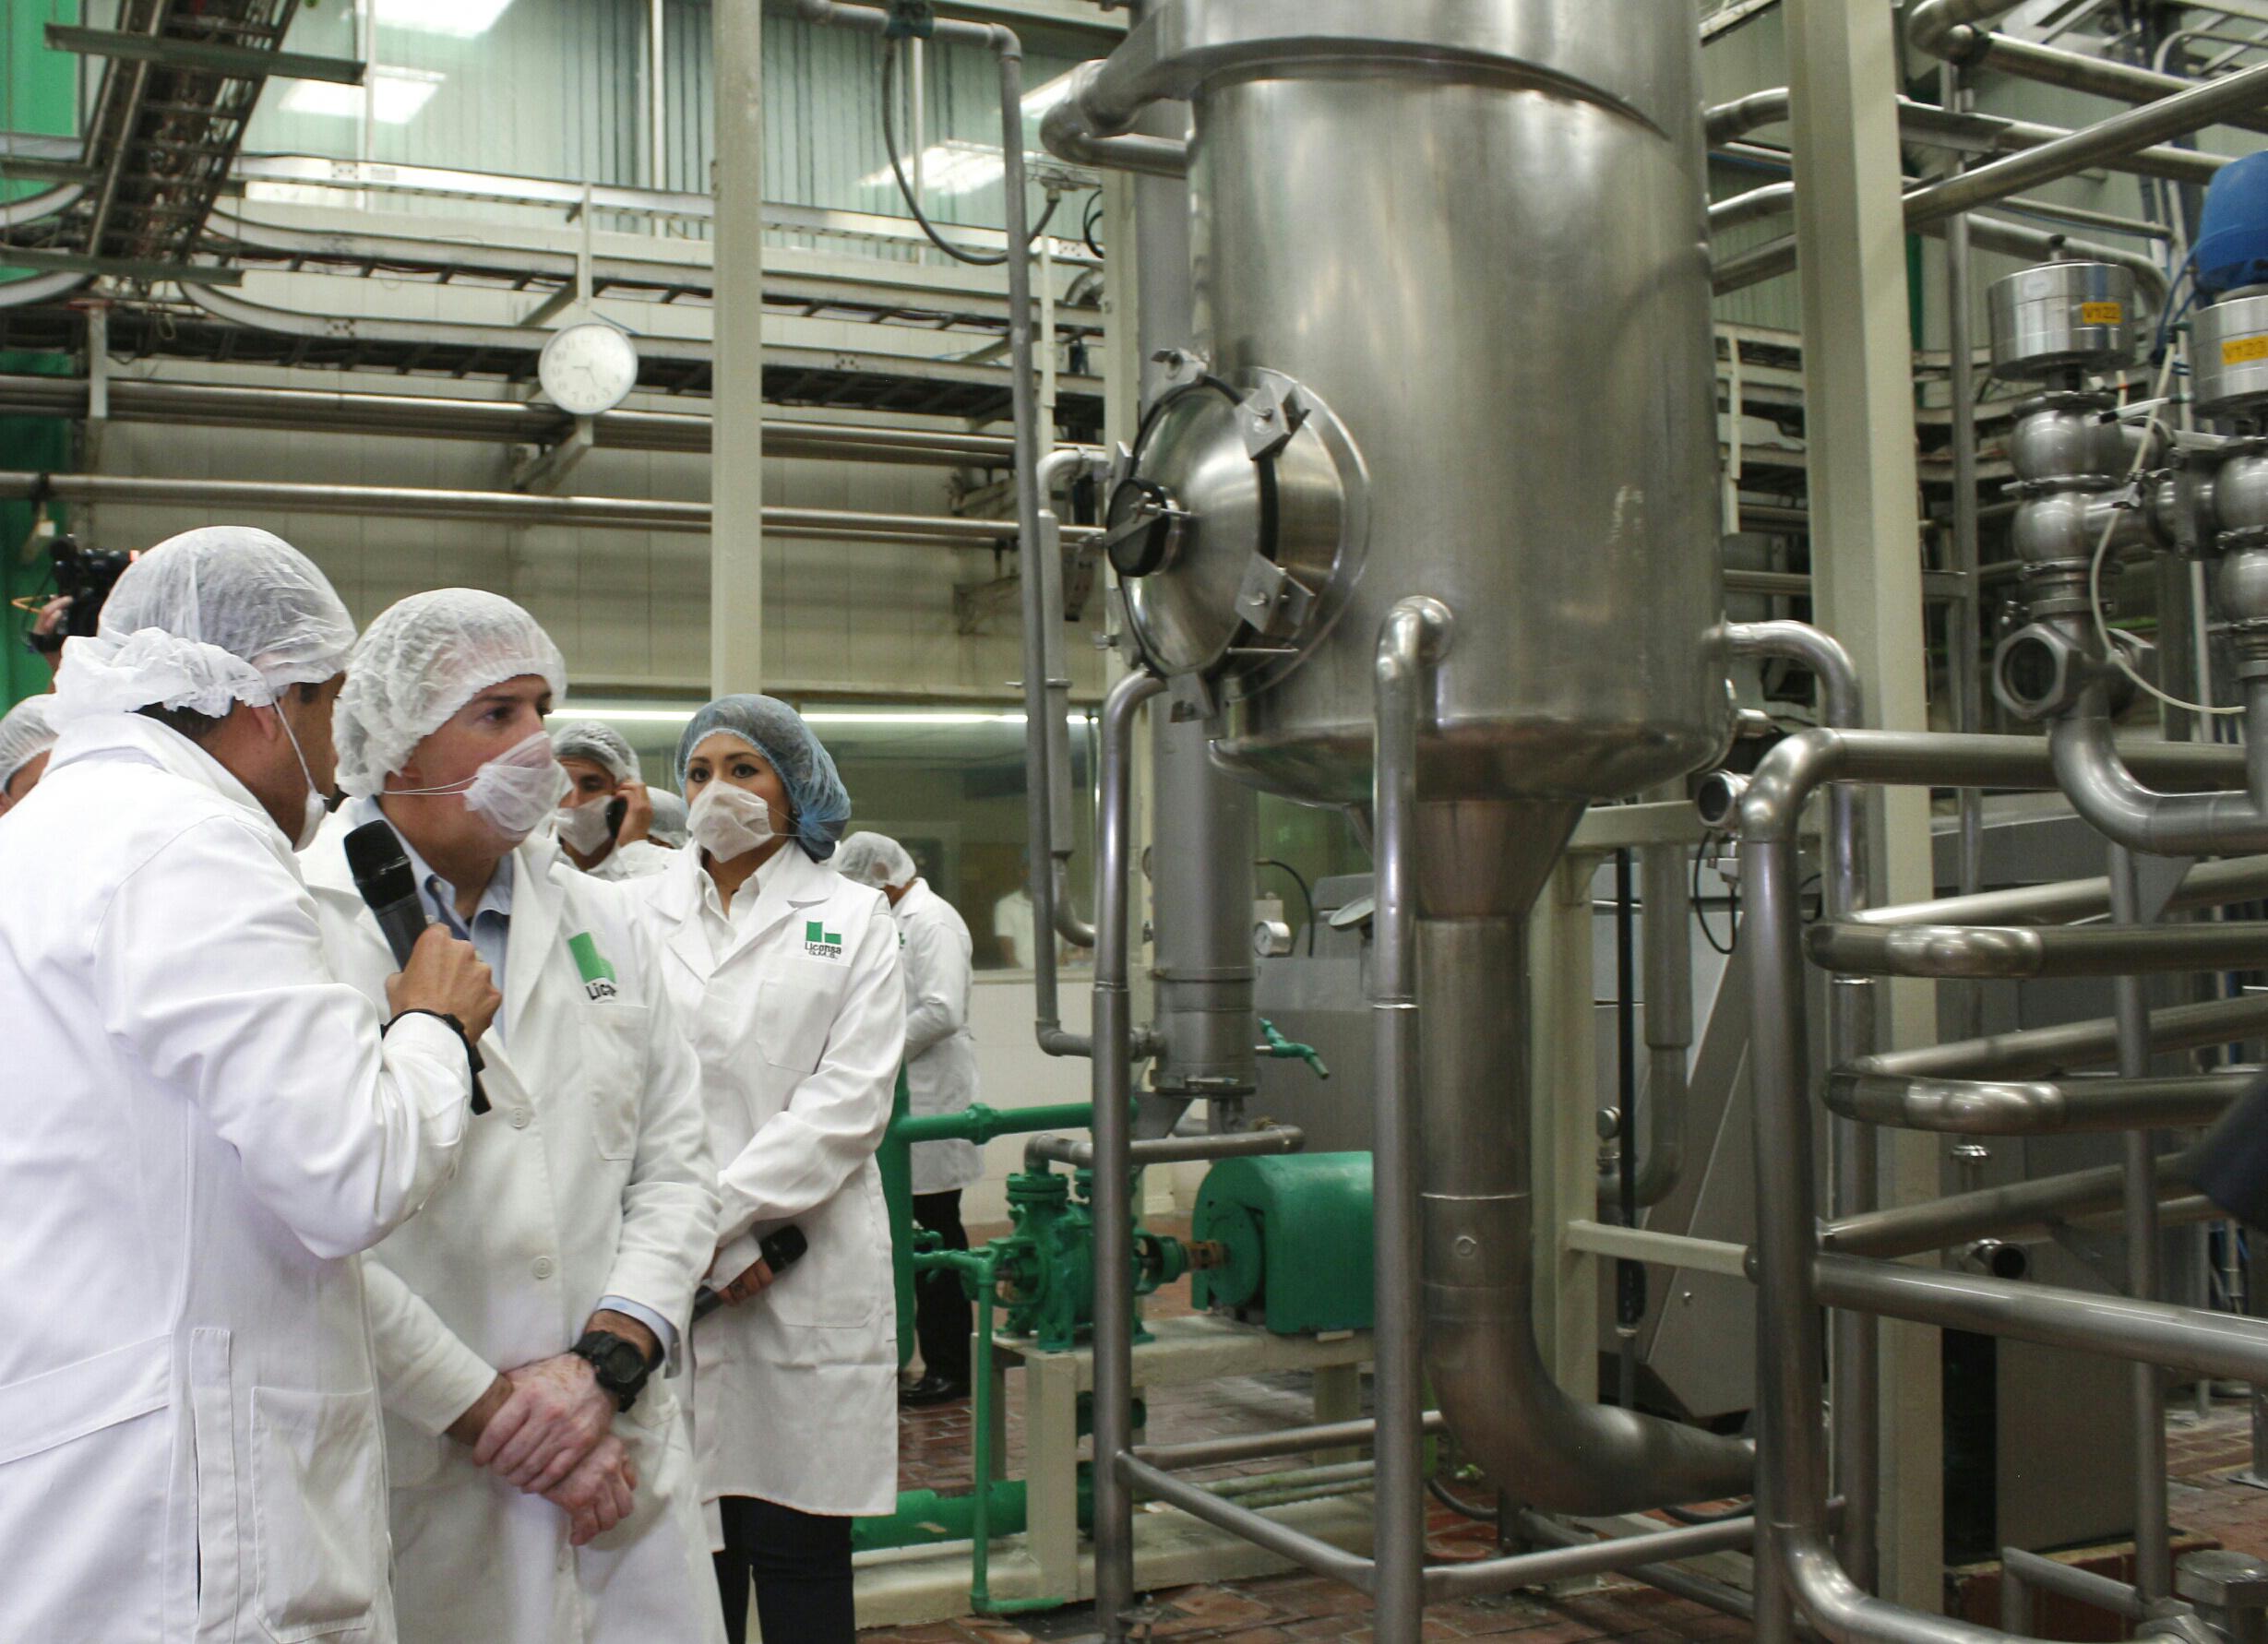 FOTO 3 Liconsa transparentara  la venta de la crema de leche que produce.jpg